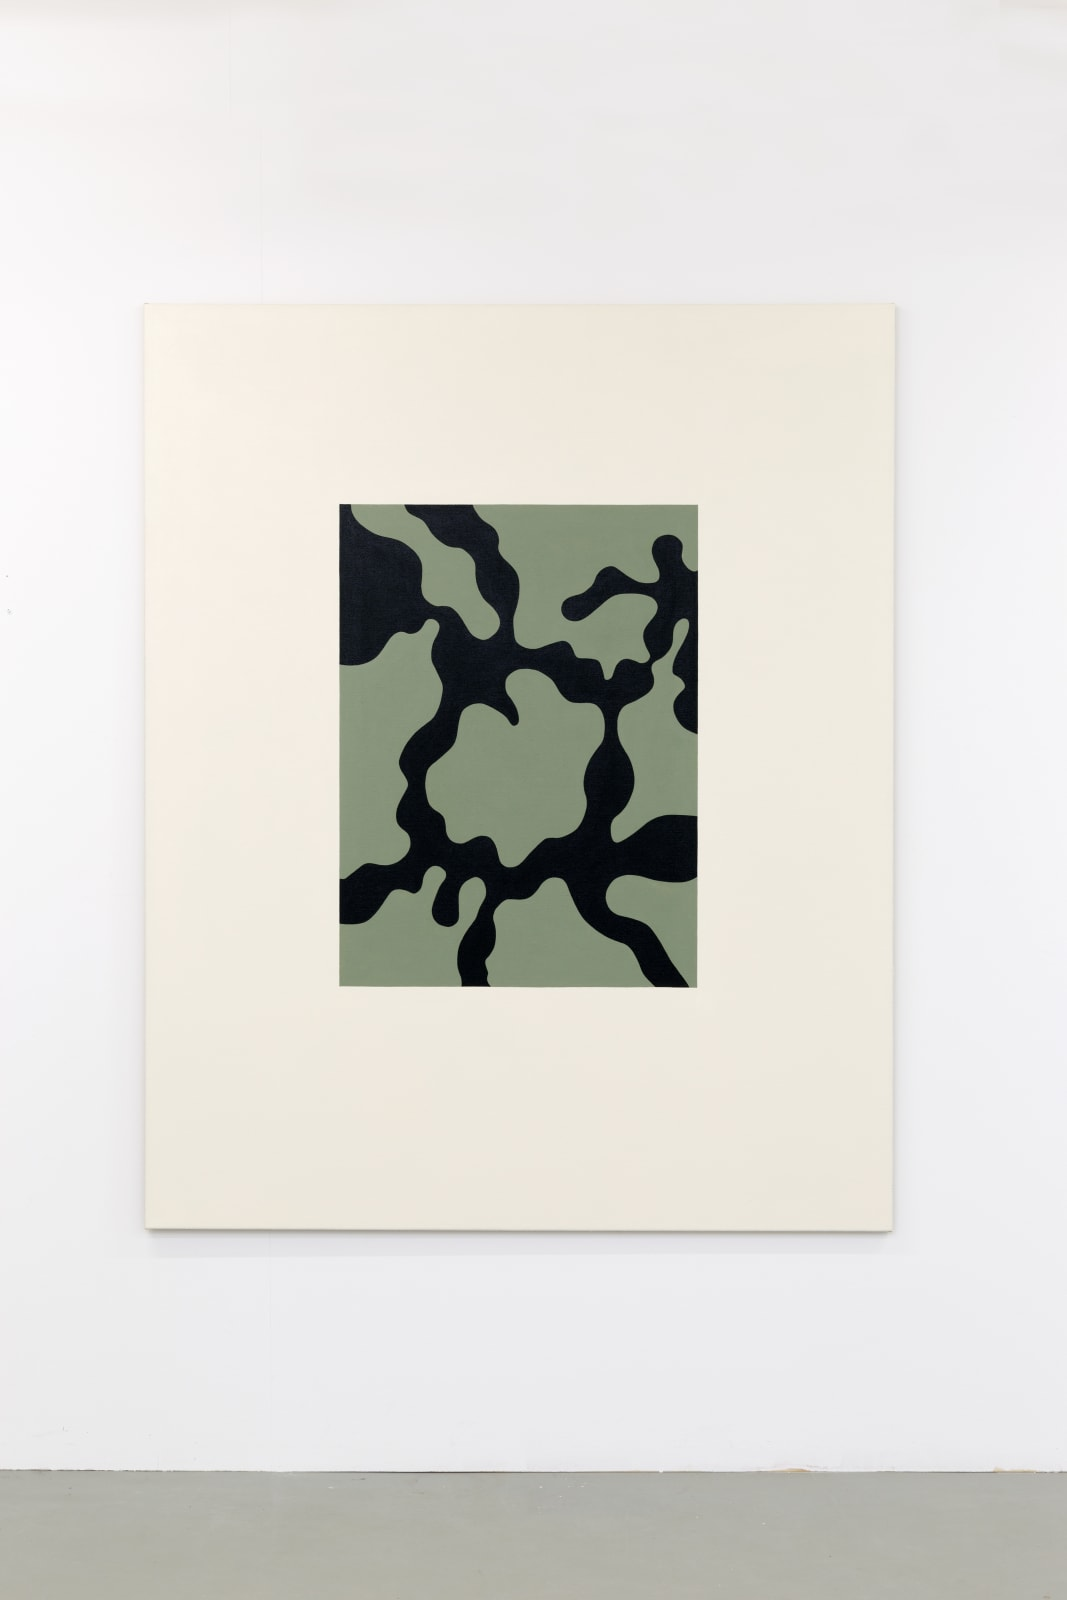 Thomas Raat, Copy, 2019